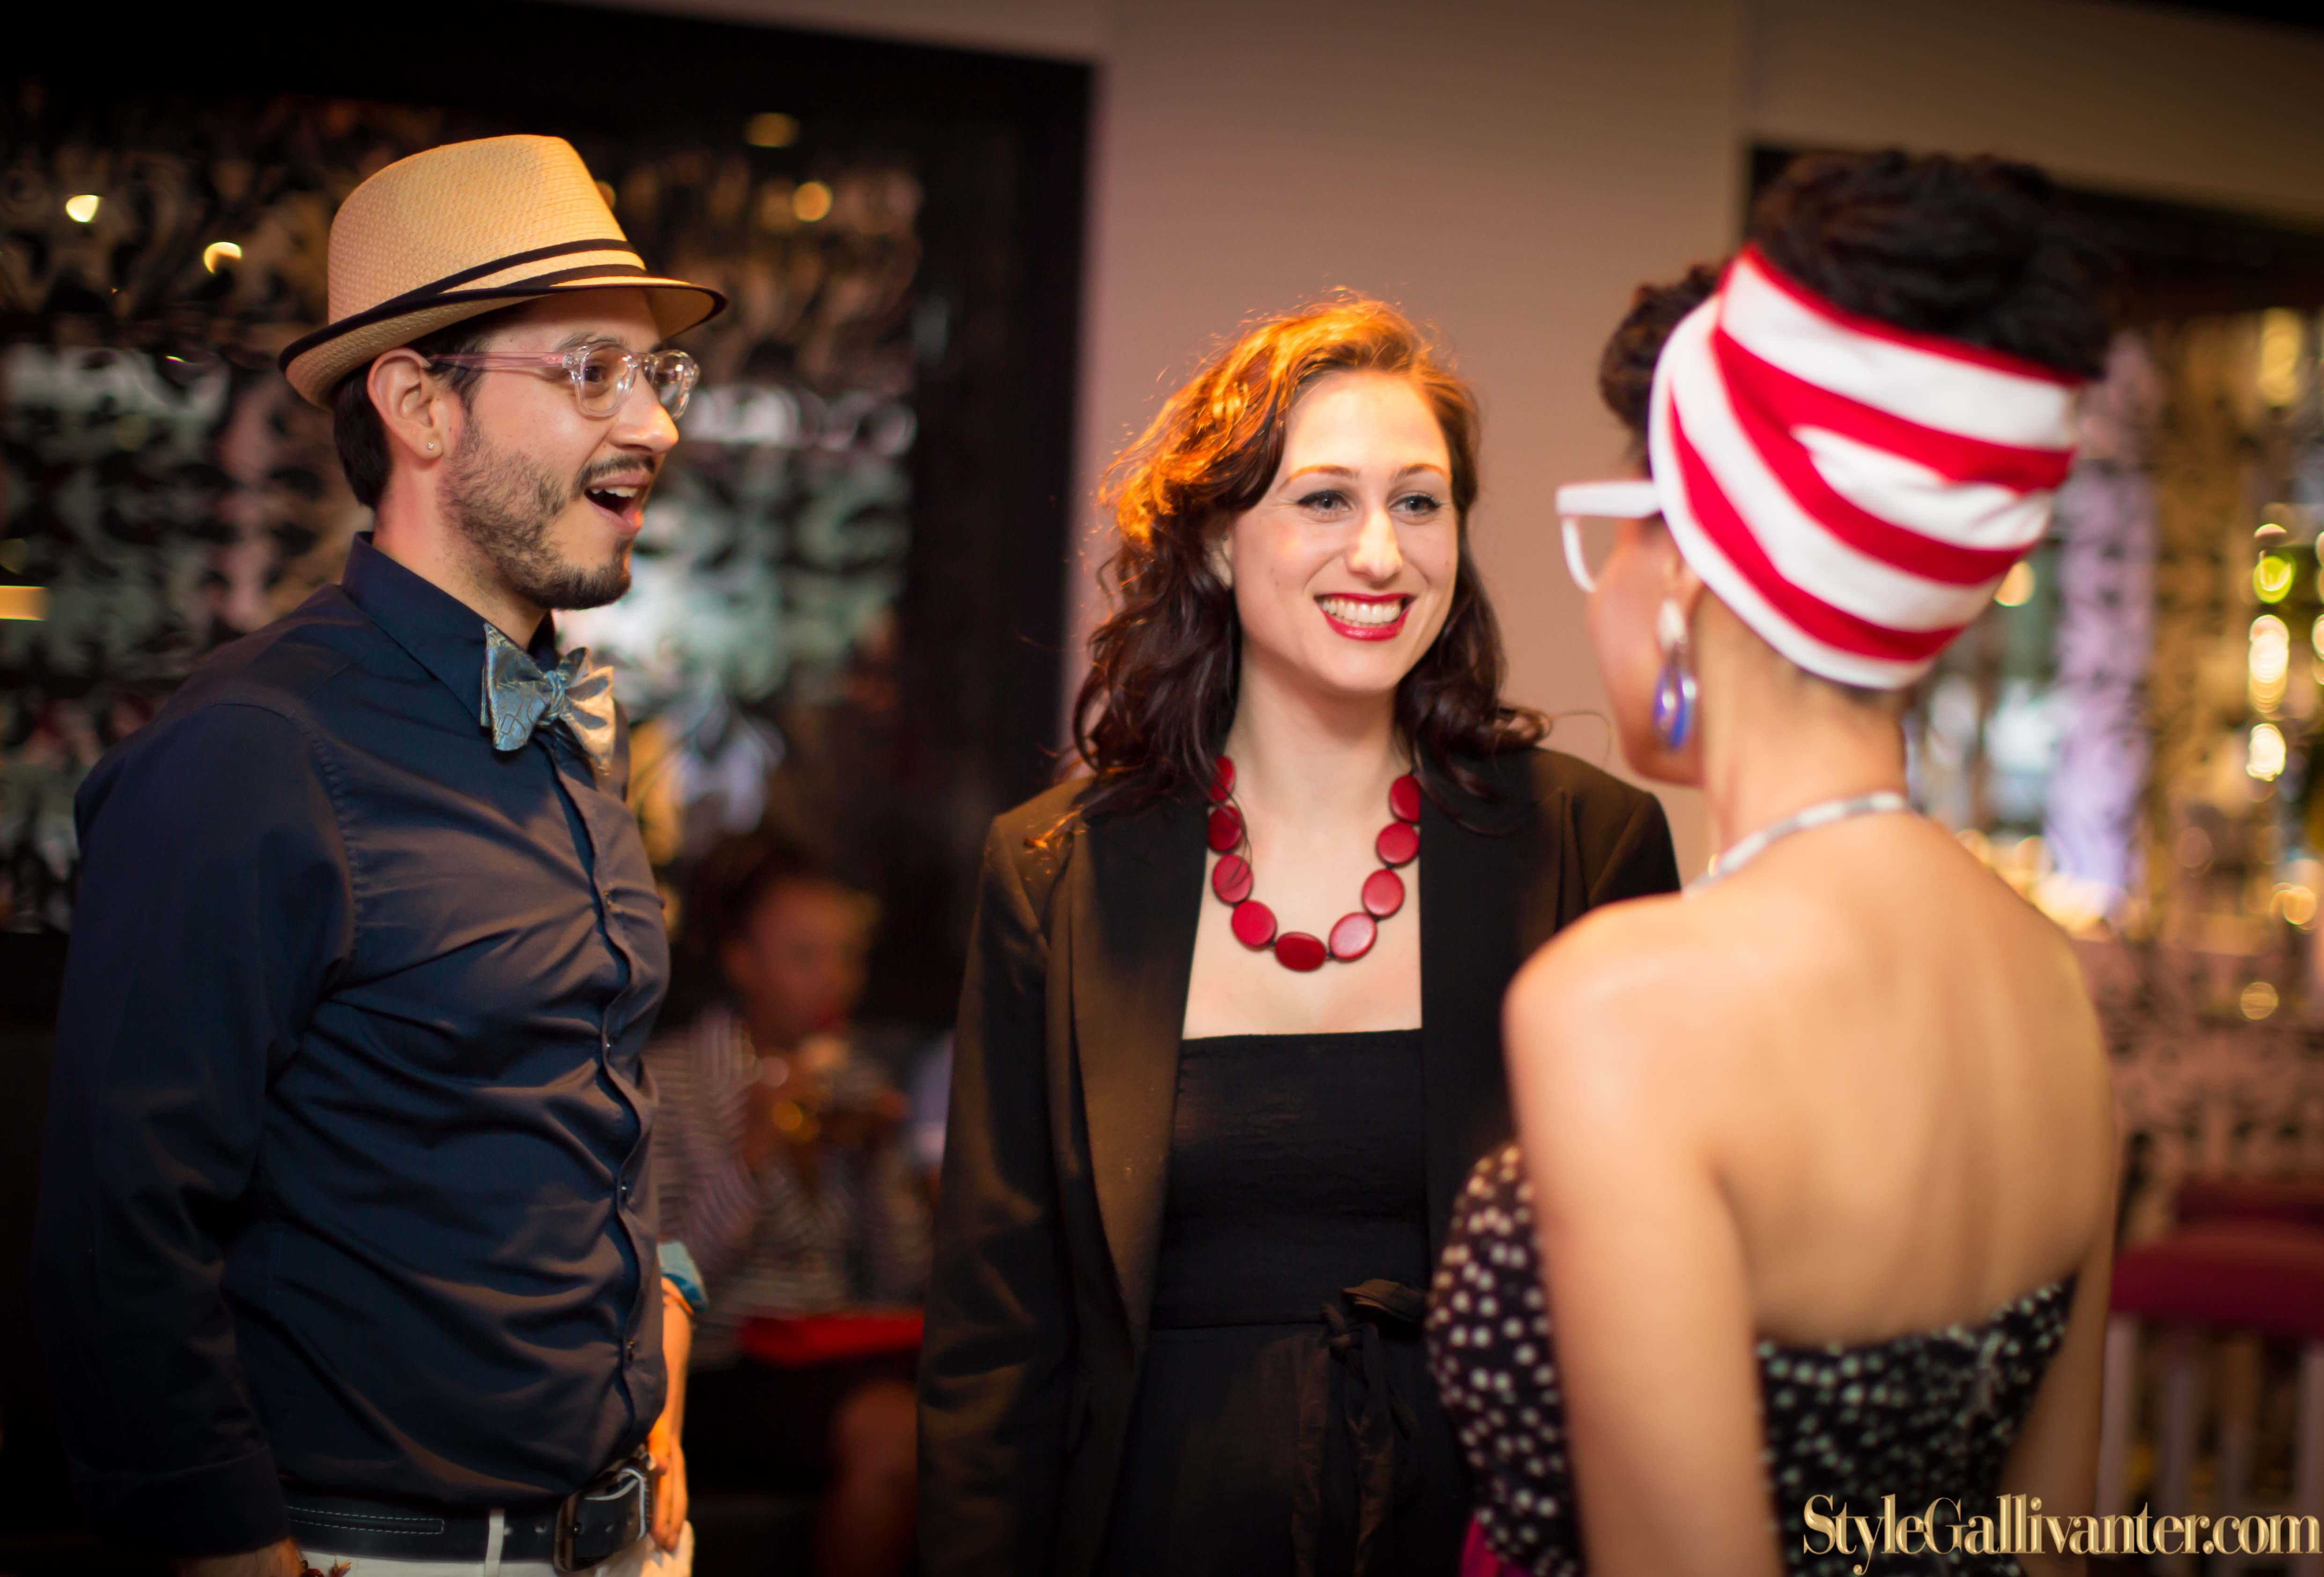 fashion-events-melbourne-2014_niche-on-bridge-restaurant_niche-function-room-richmond_best-venues-melbourne_high-fashion-venues-melbourne_melbourne's-best-fashion-bloggers-2014